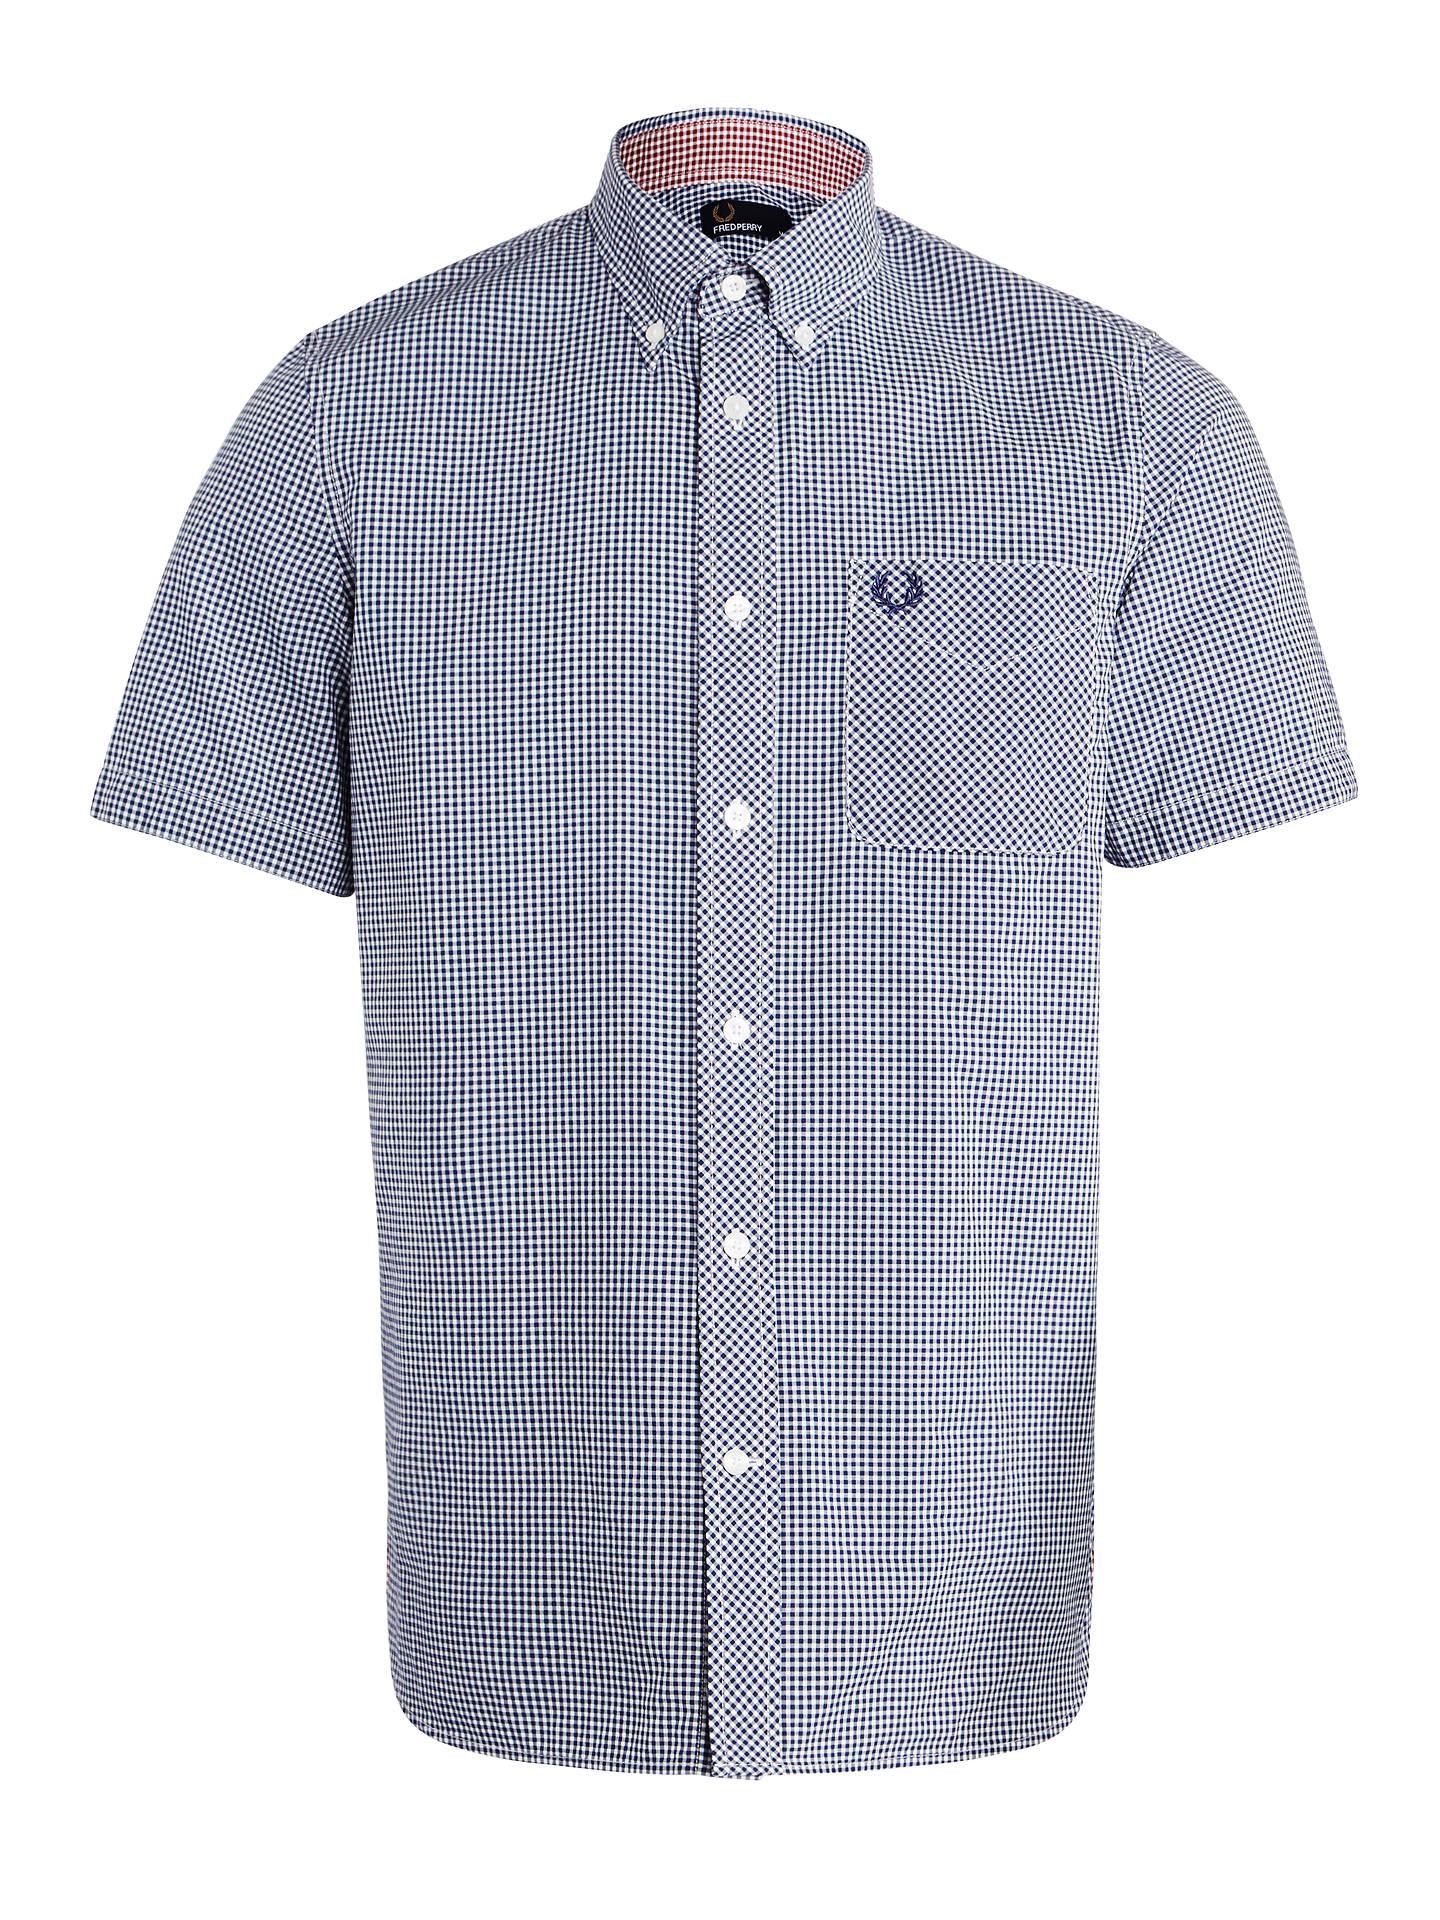 755e41b5d Buy Fred Perry Short Sleeve Poplin Shirt